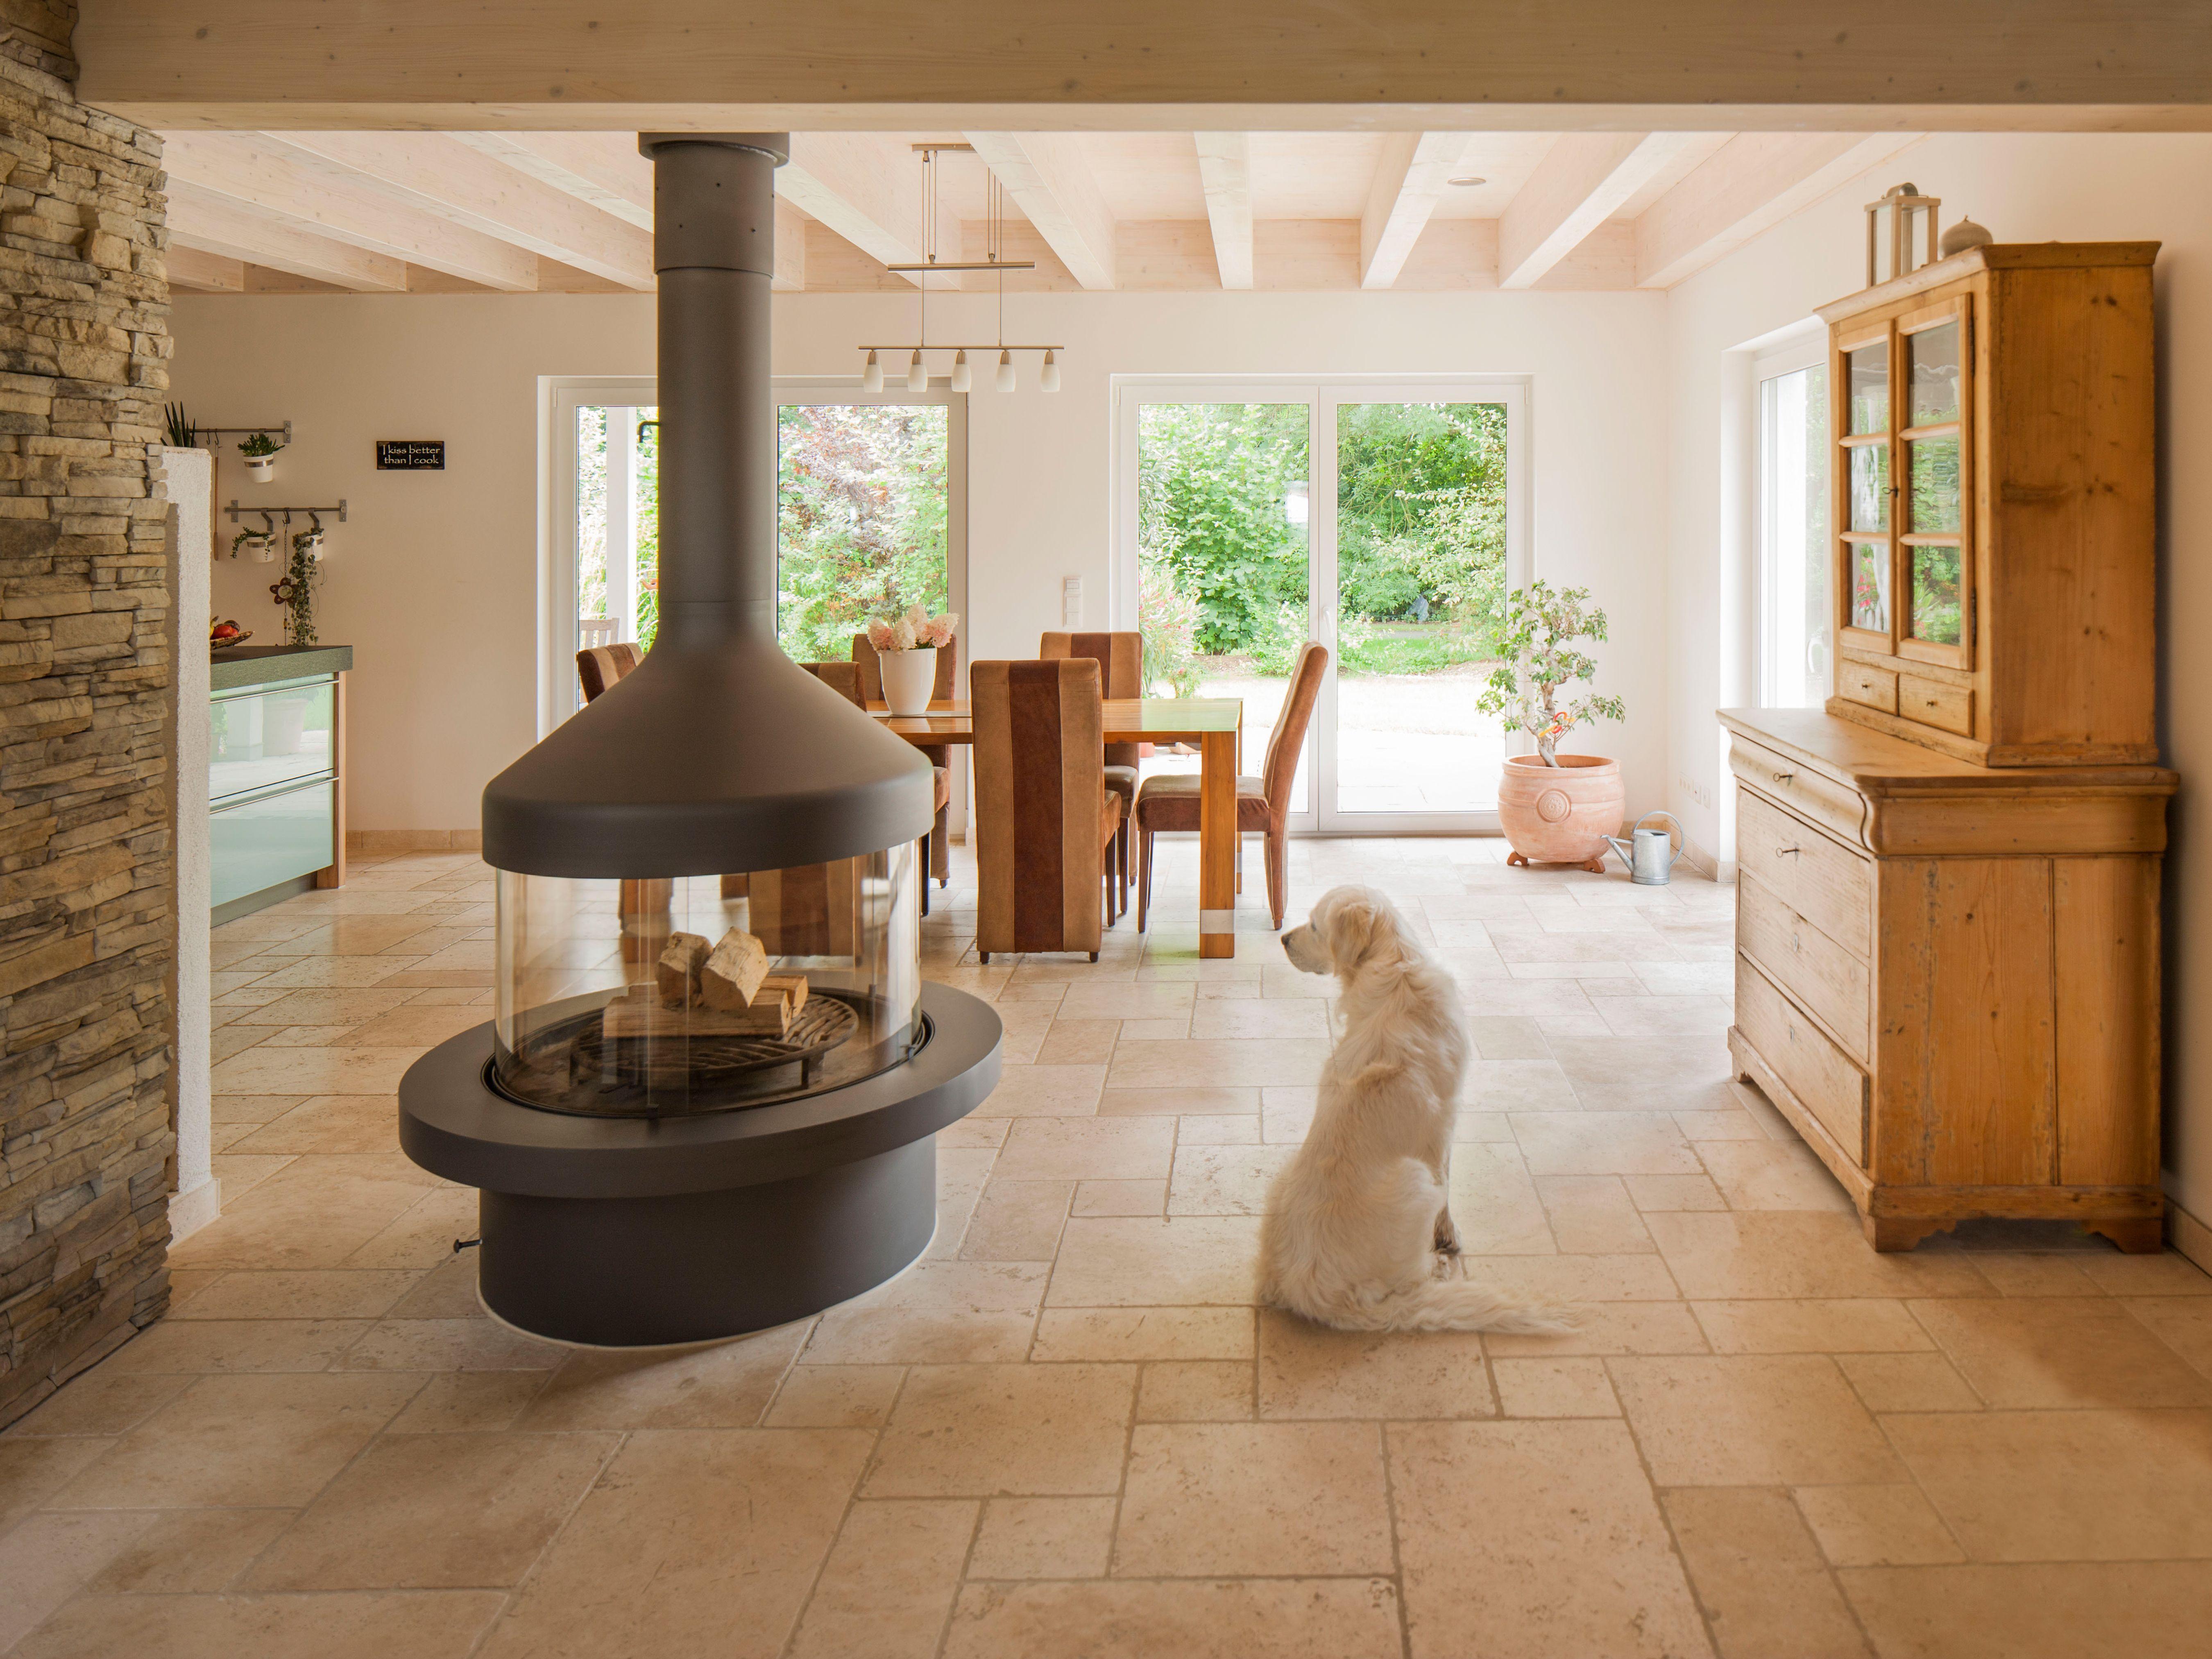 Fliesen Wohnzimmer Landhaus Bude, Fireplaces, Pergola, Home And Garden,  Terracotta, Rustic